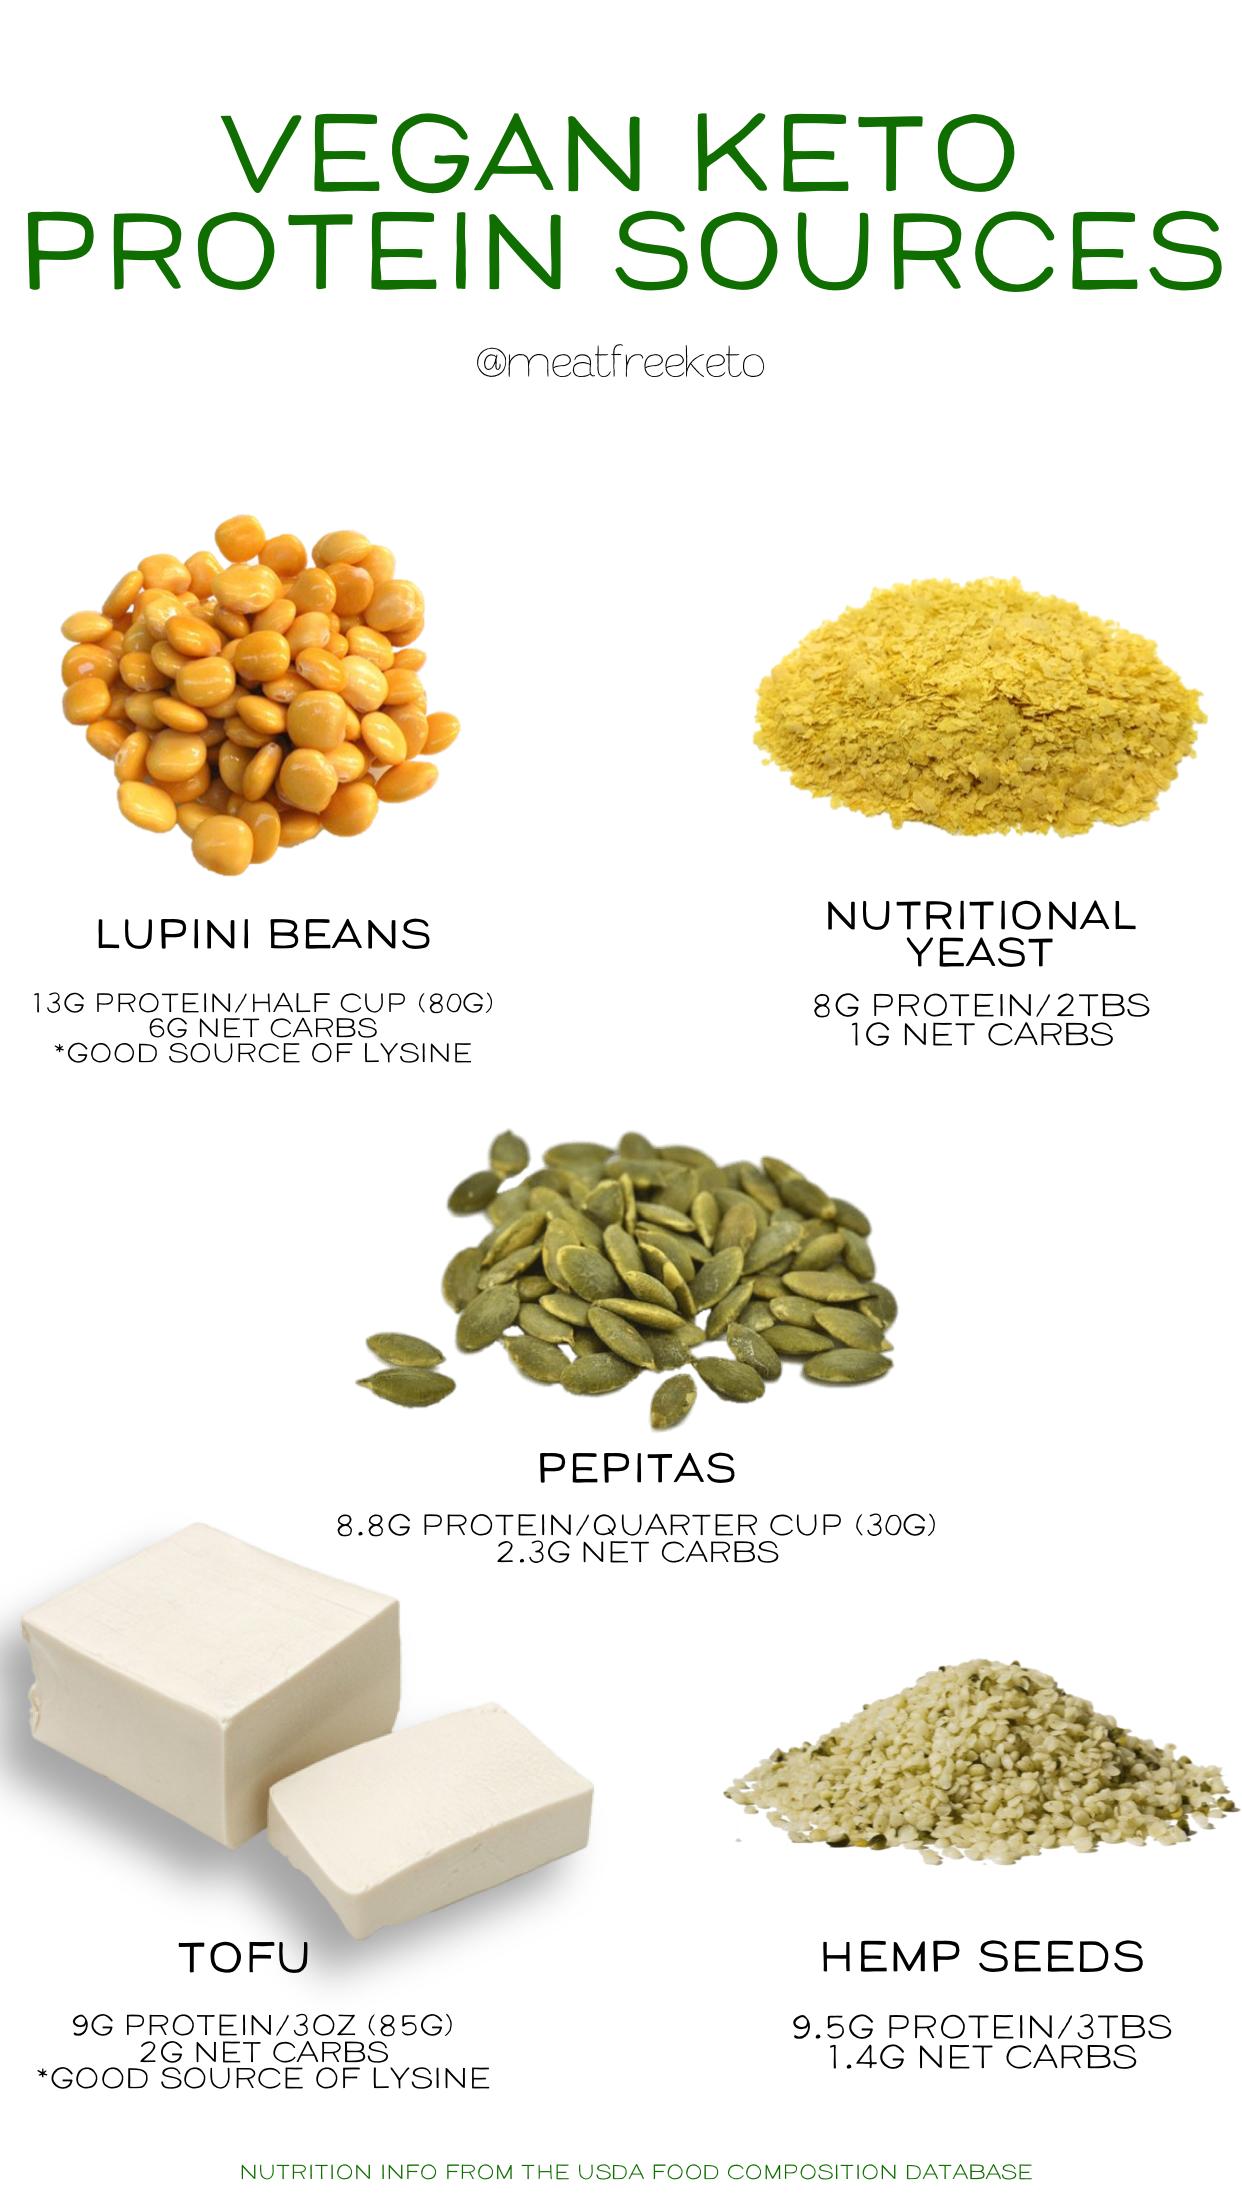 Where Do You Get Protein On A Vegan Keto Diet Meat Free Keto Vegan Keto Recipes